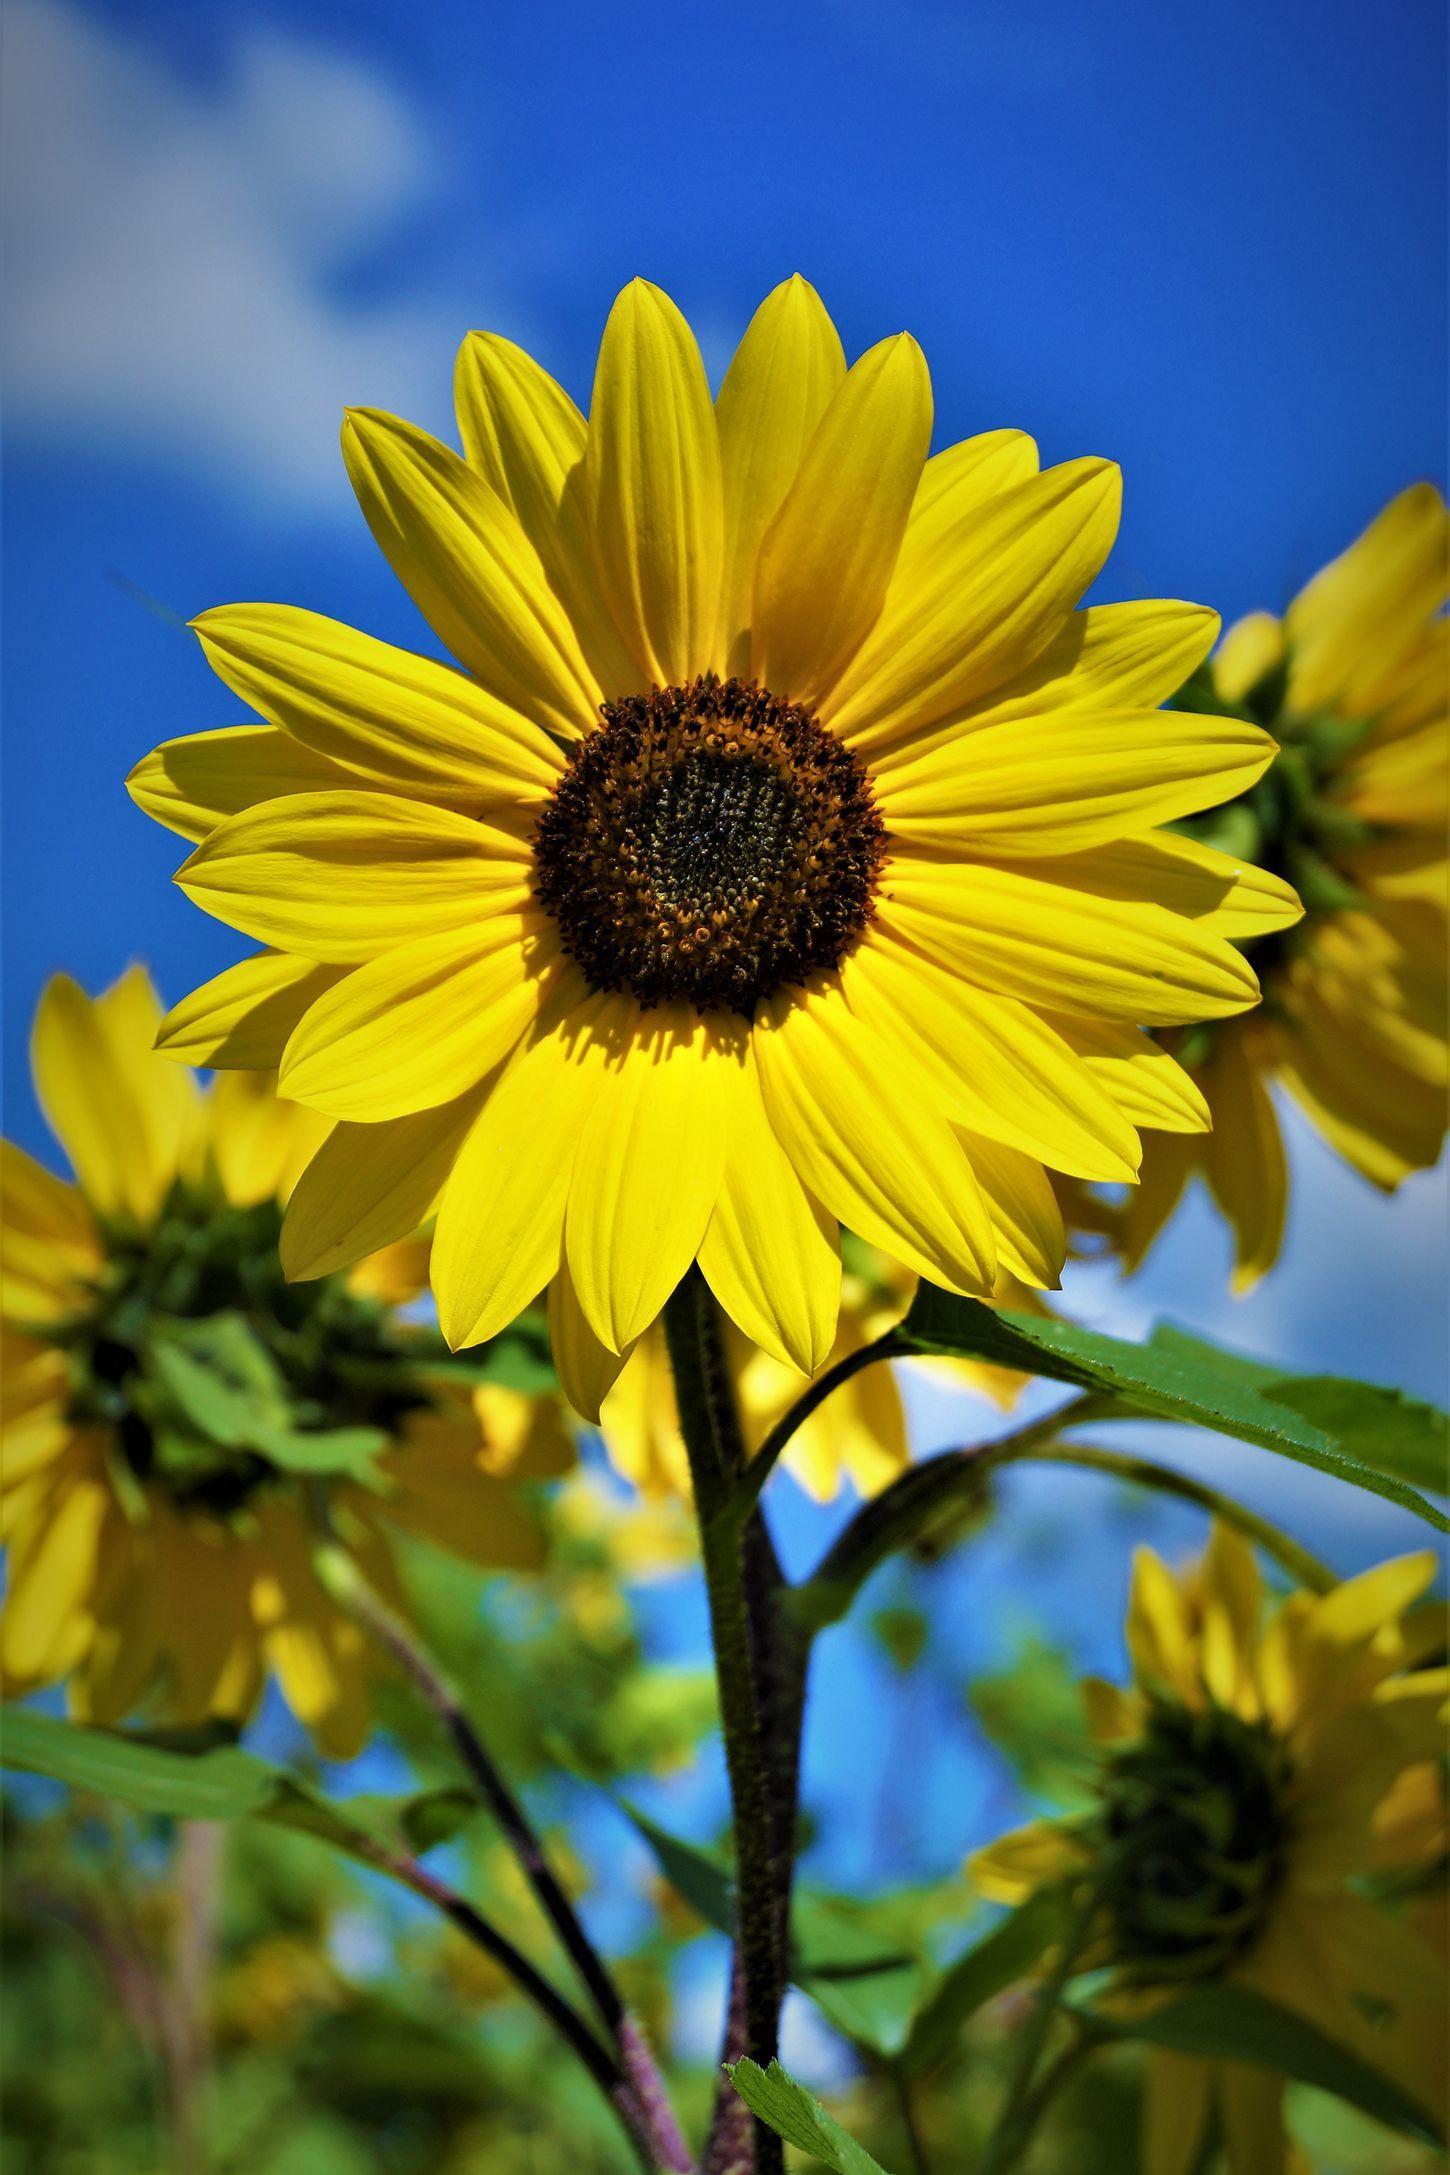 The Prettiest Sunflower Fields To Visit Across The U S Sunflower Field Near Me Sunflower Fields Sunflower